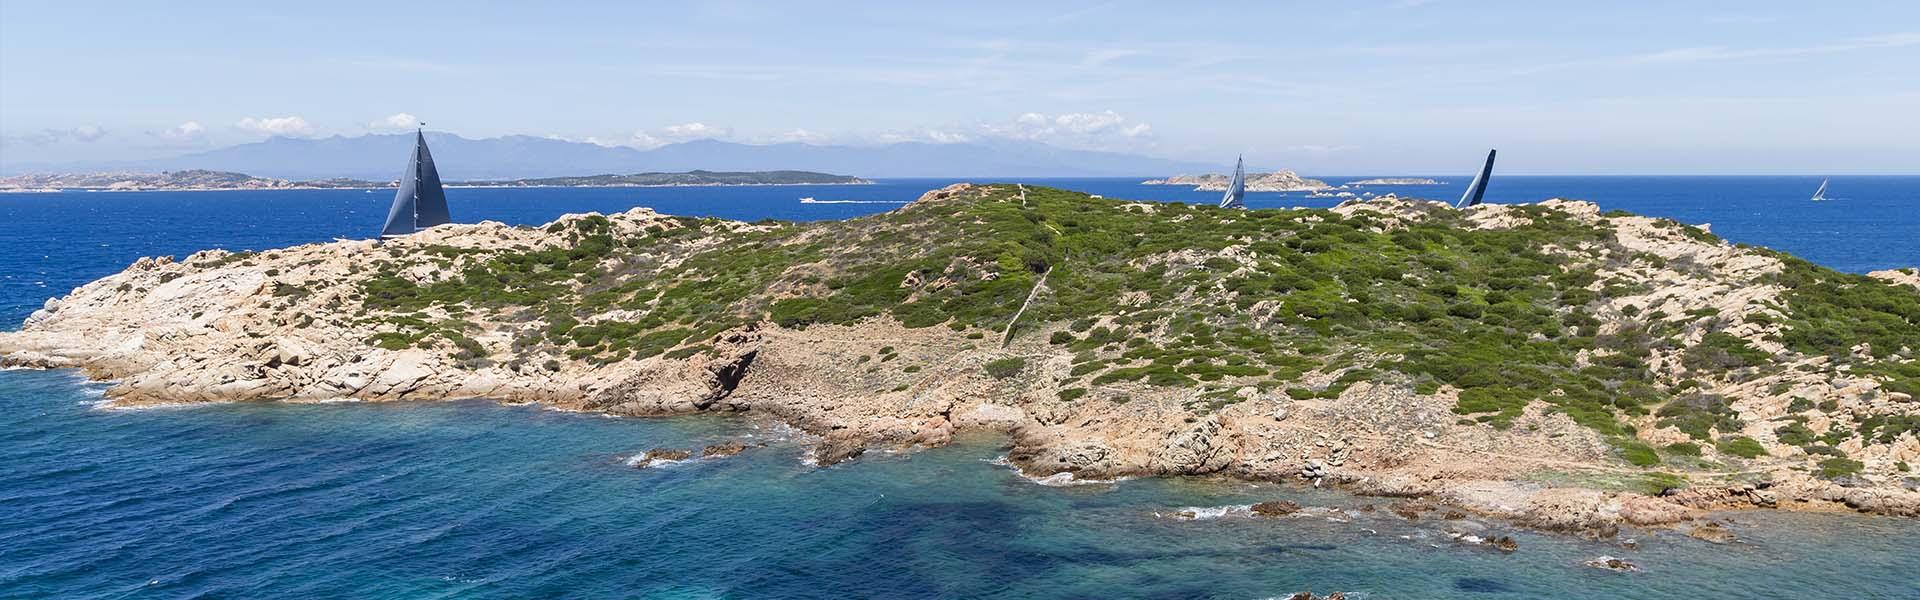 Loro Piana Superyacht Regatta  - Porto Cervo 2019